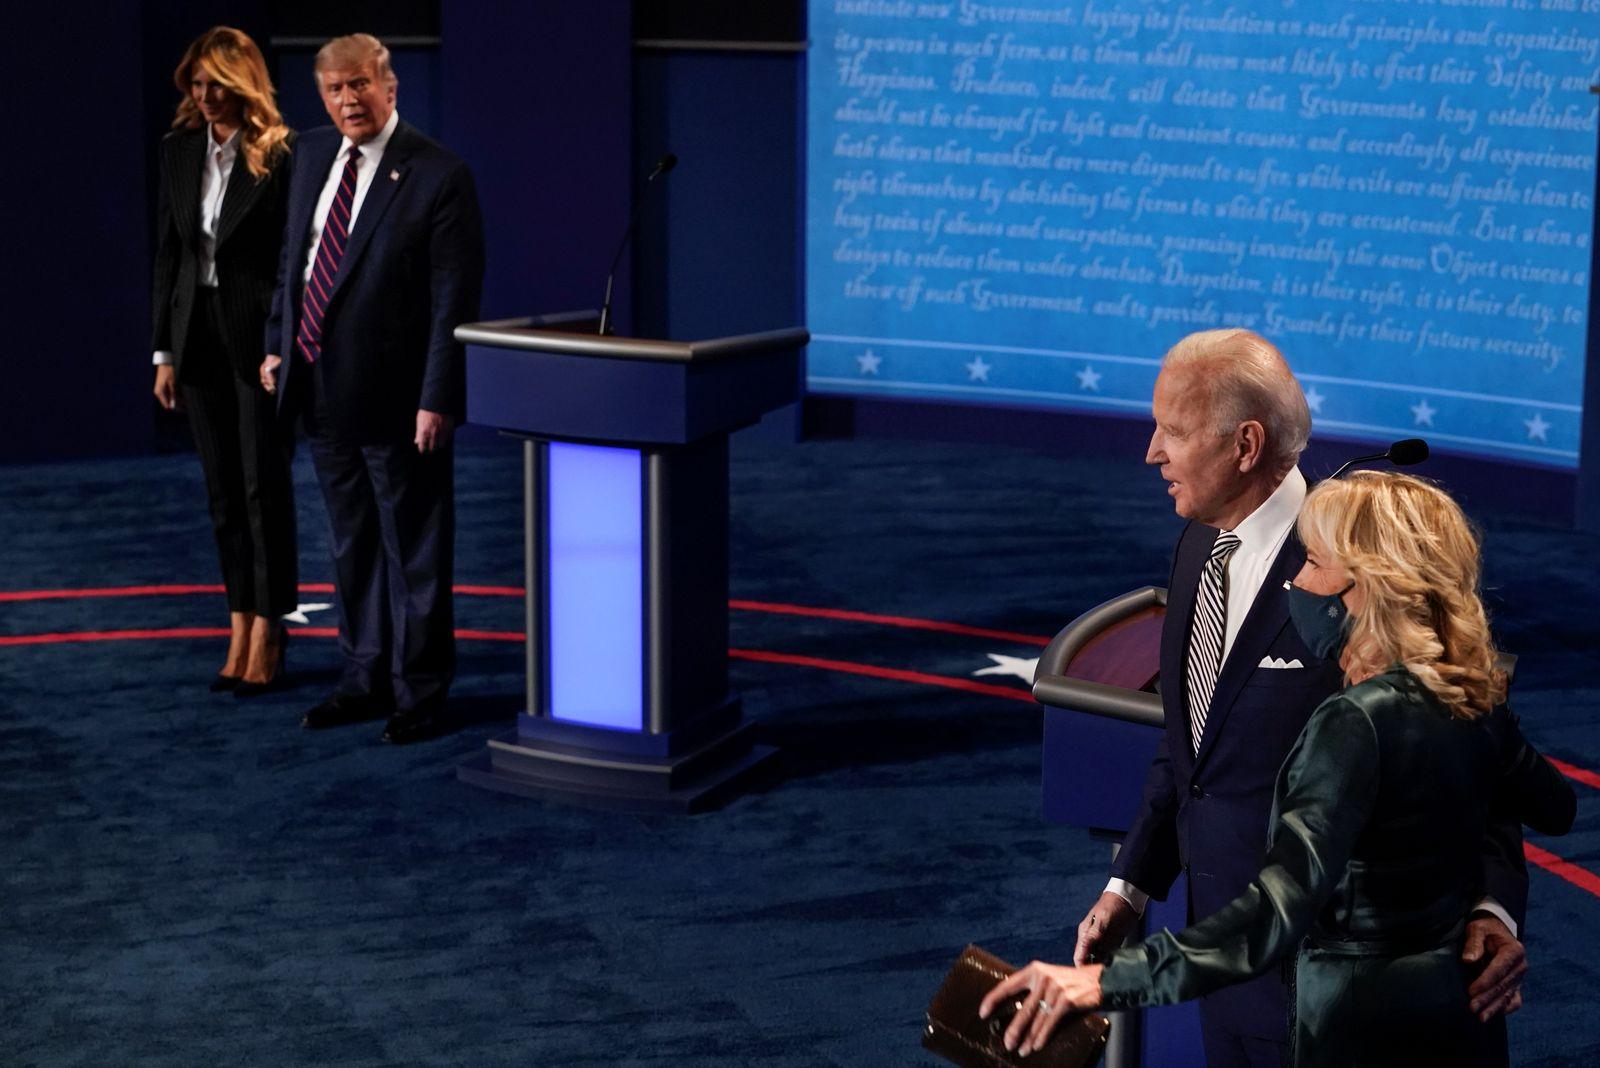 2020 presidential campaign debate in Cleveland